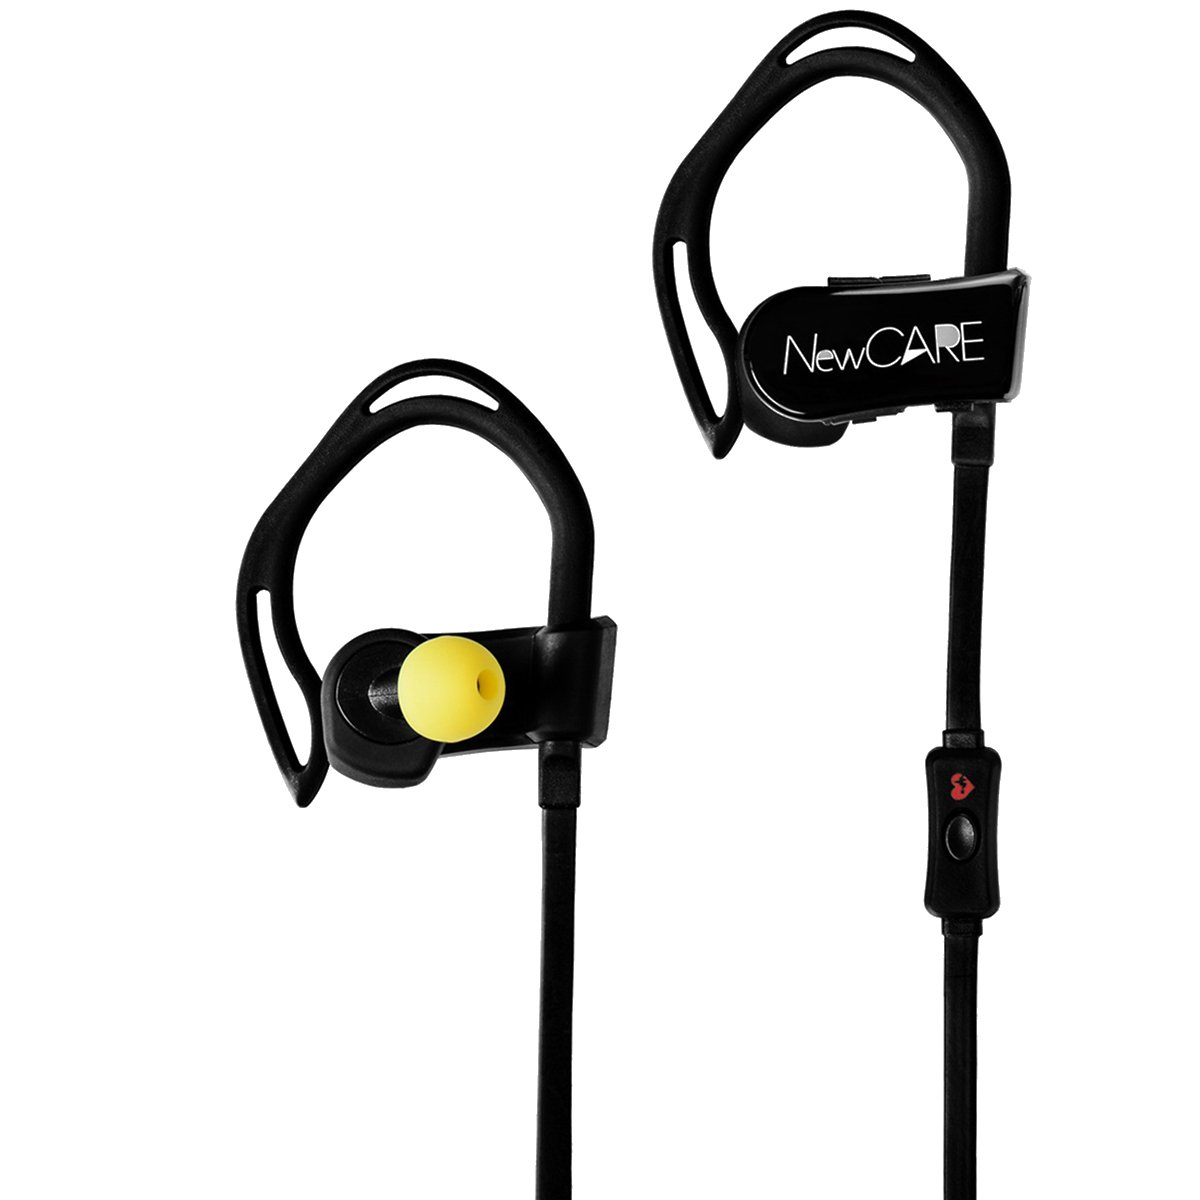 Pulse Earbuds Sweatproof Headphones Wireless Bluetooth Headphones Wireless Sport Earbuds with Built-In Heart Rate Monitor Running Exercise justmysport CH_APPSPOBLUHEA001